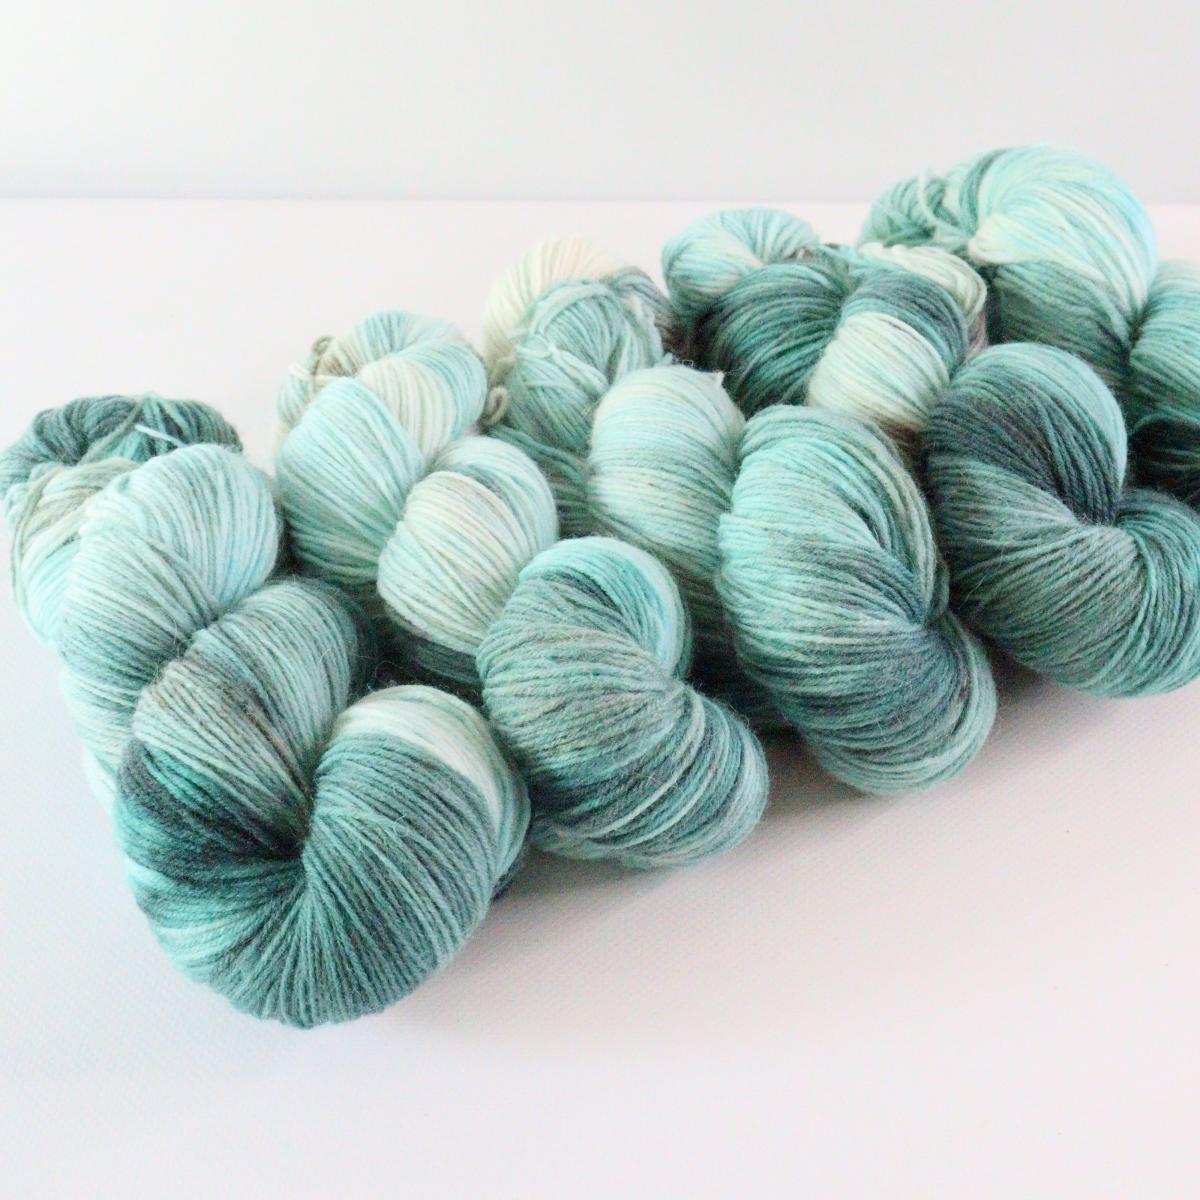 woodico.pro hand dyed yarn 074 1 1200x1200 - Hand dyed yarn / 074